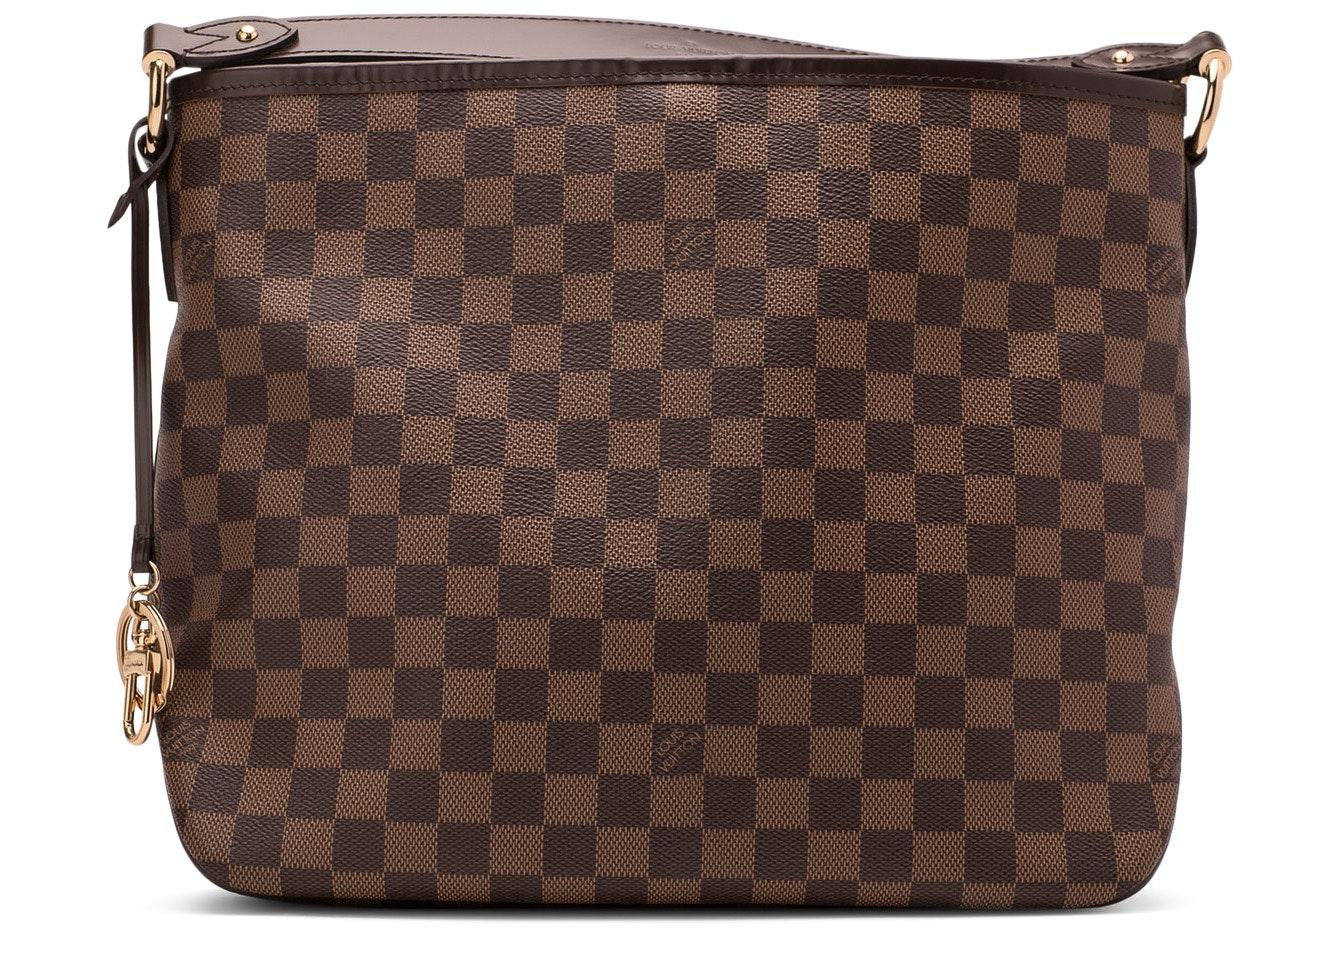 Louis Vuitton Delightful Nm Damier Ebene PM Brown